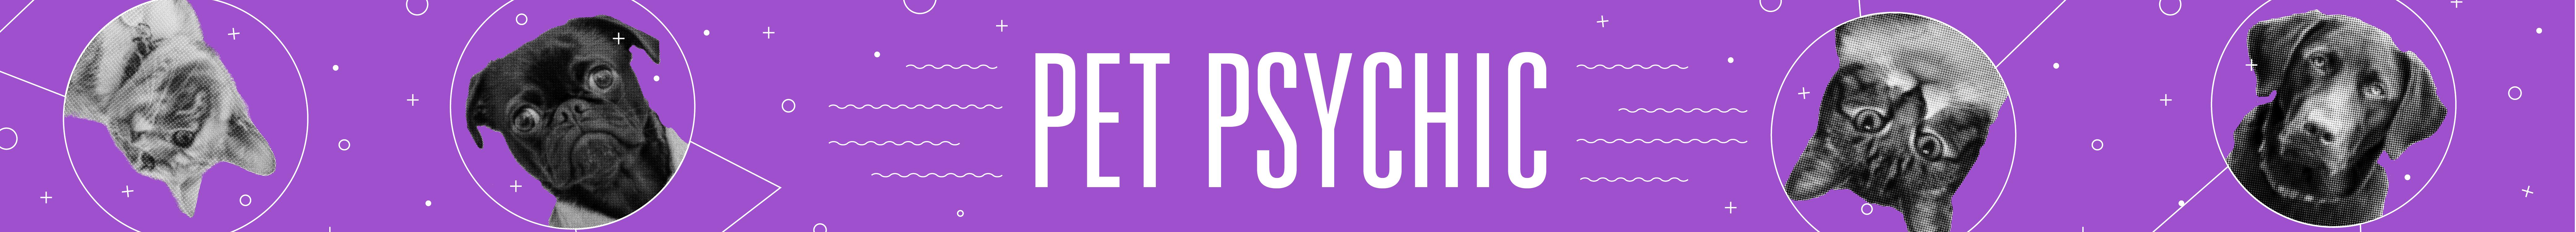 Pet Psychic Banner